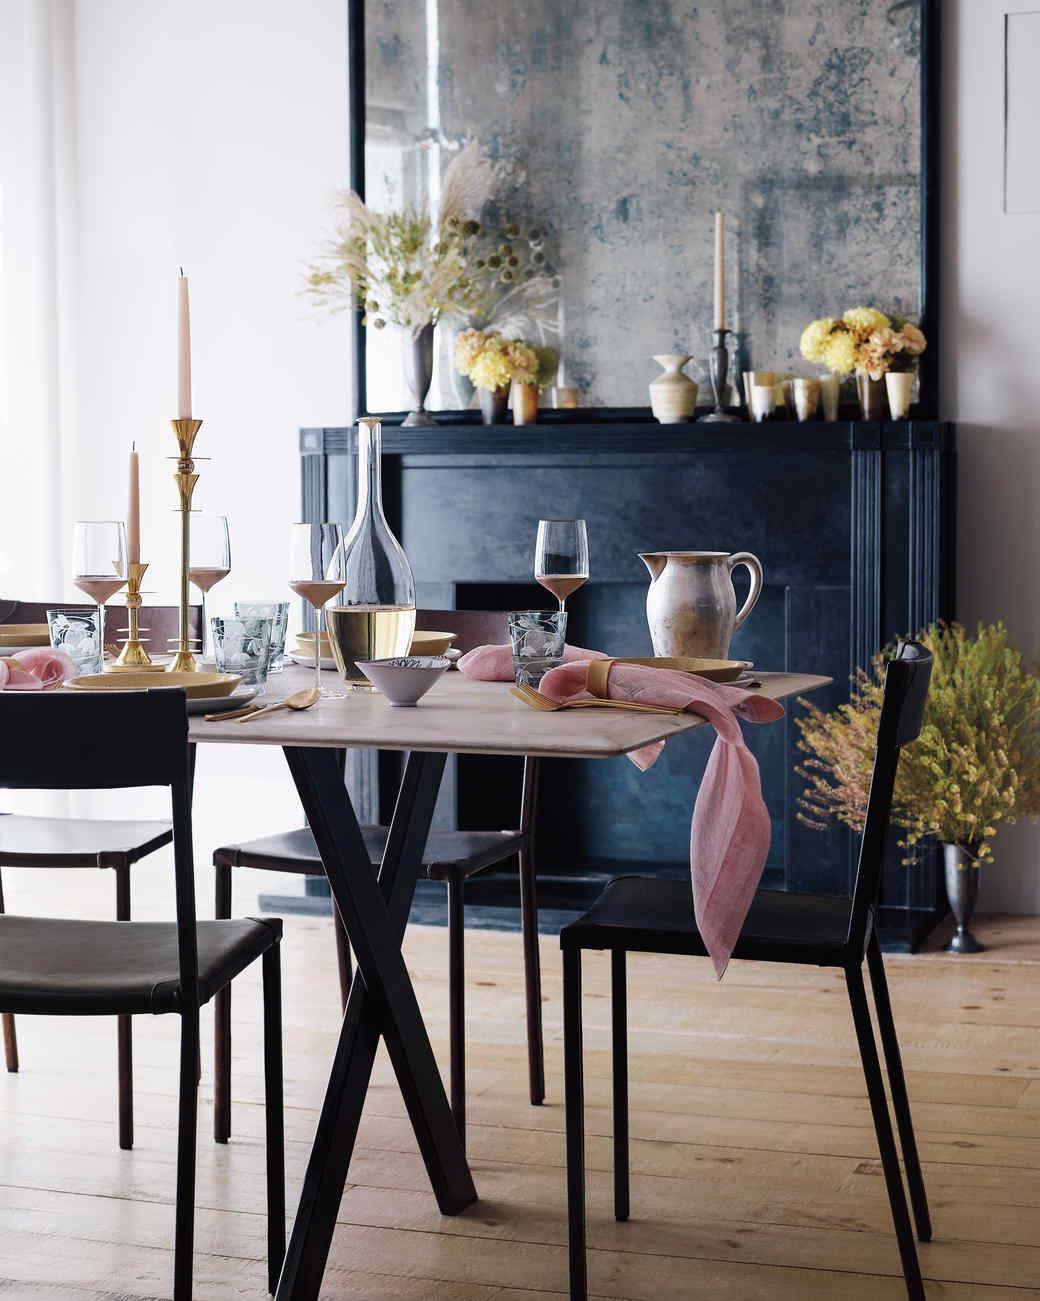 thanksgiving-table-top-setting-0082-d112352.jpg